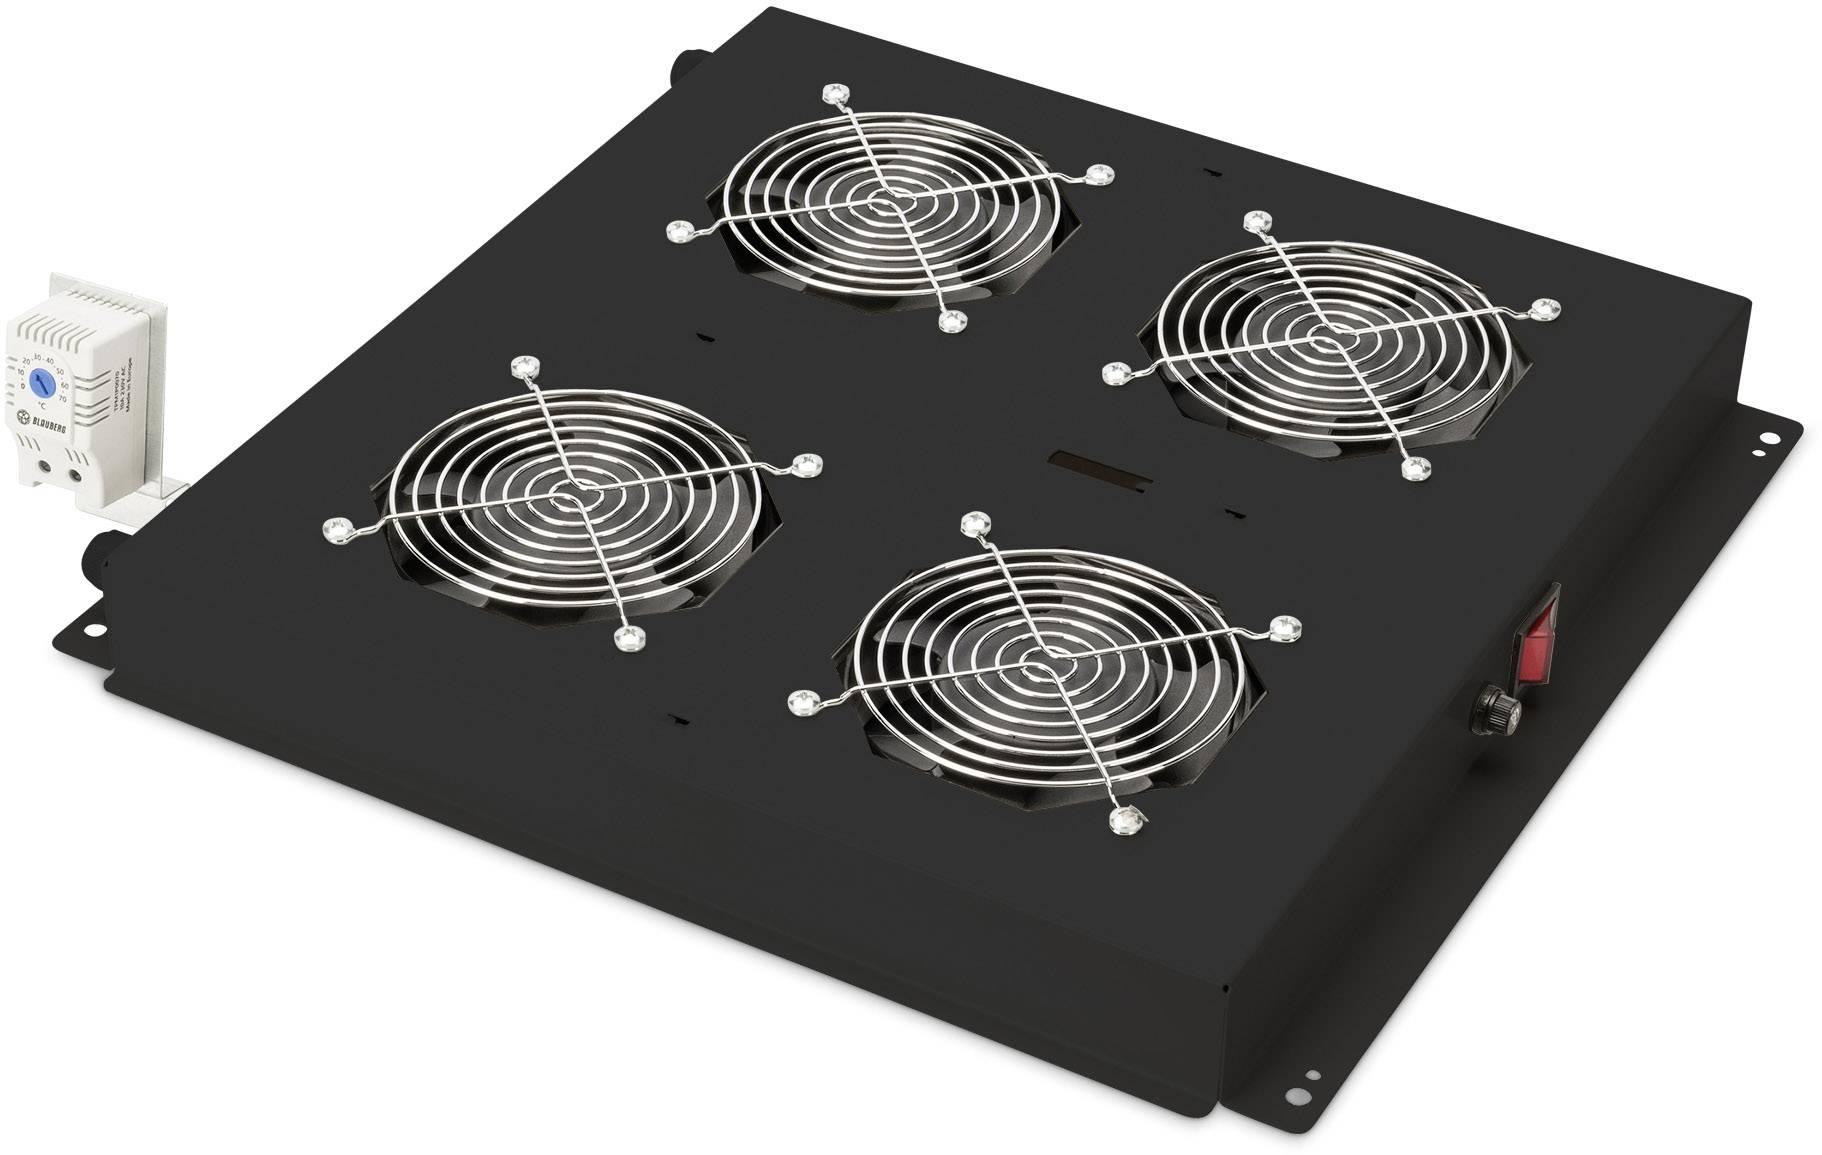 "Větrák pro datové skříně Digitus Professional DN-19 FAN-4-B-N, velikost racku (HE) 1 U, 19 """